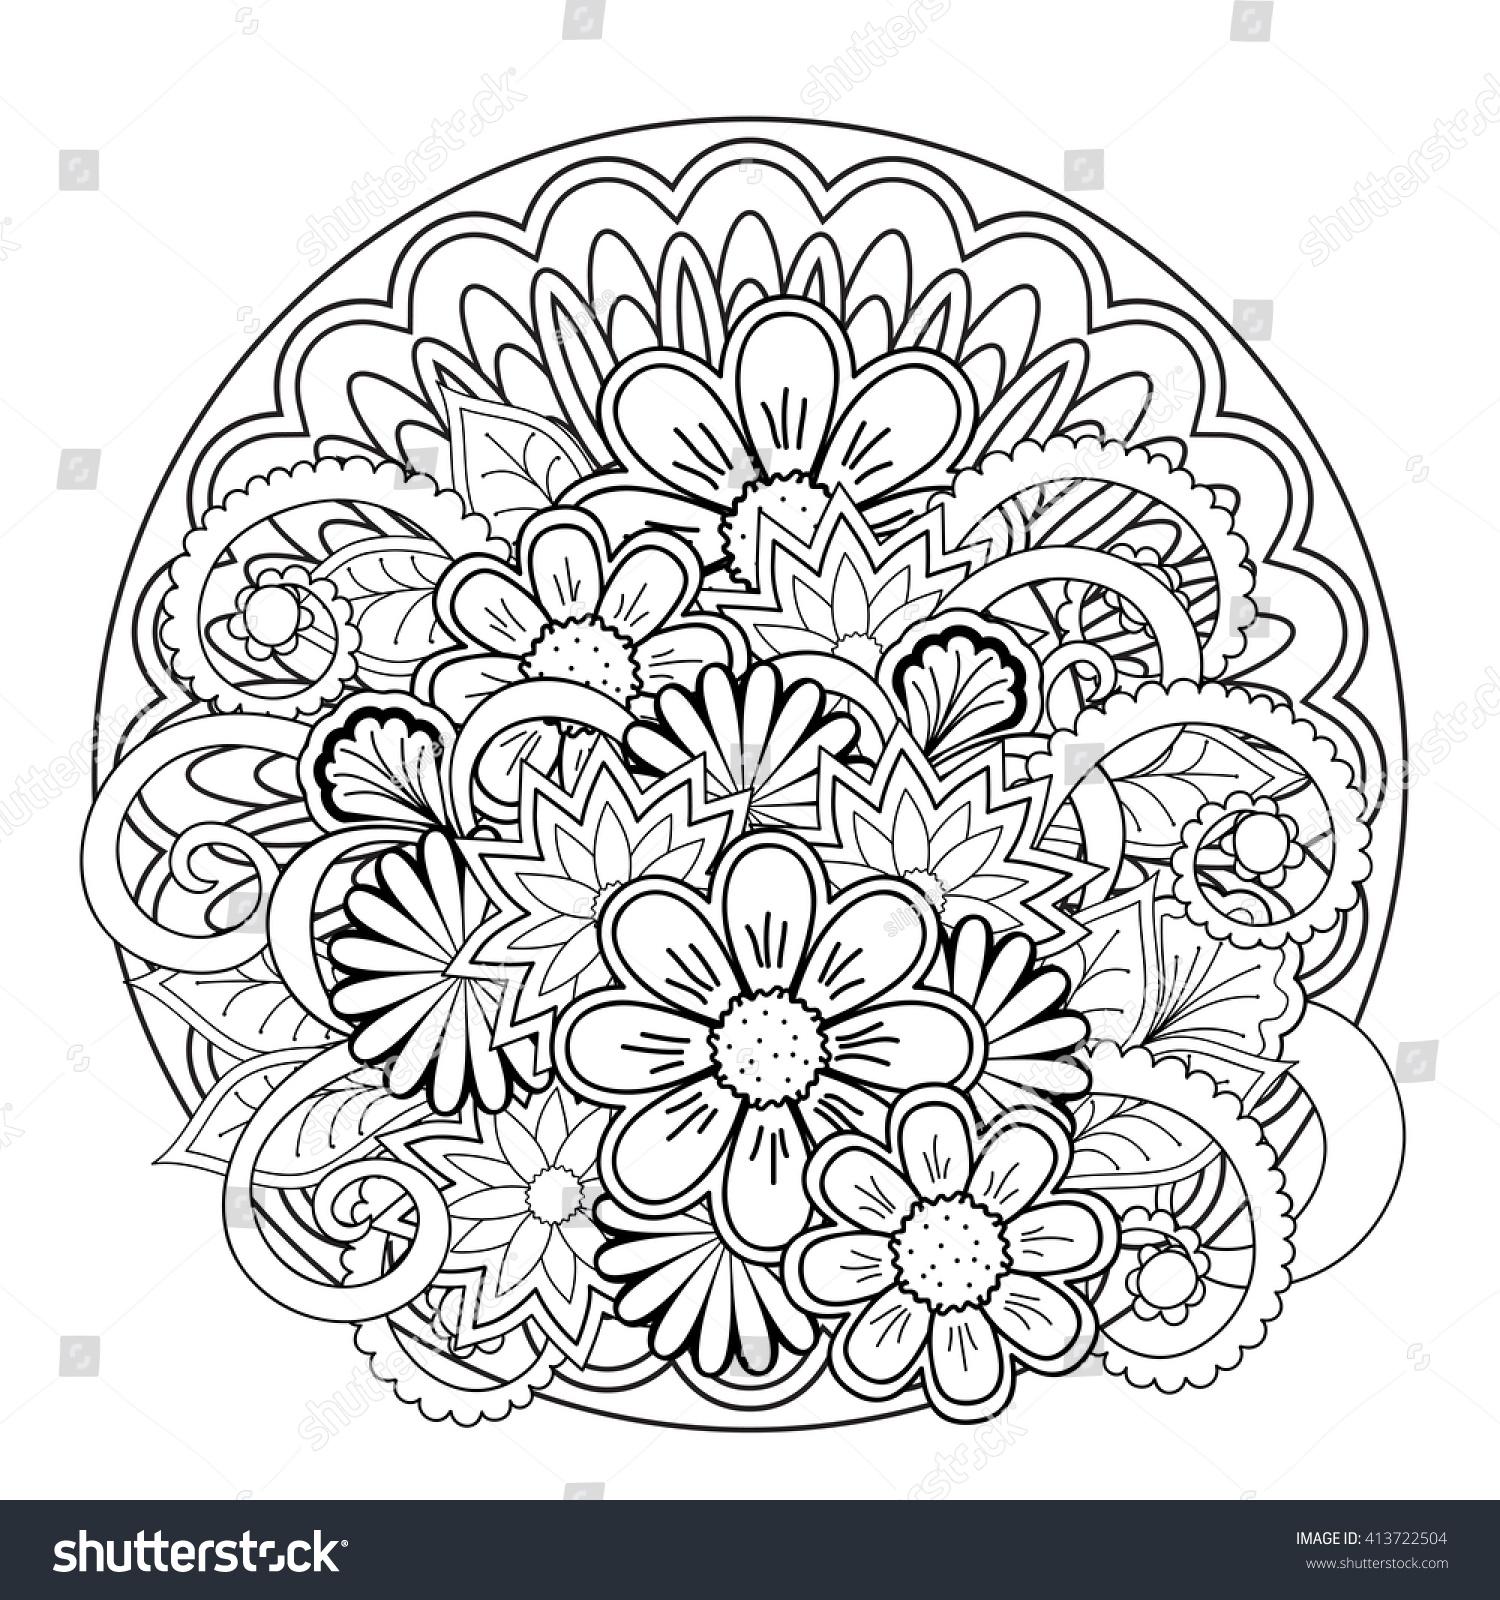 Bohemian Mandala Coloring Pages Www Topsimages Com